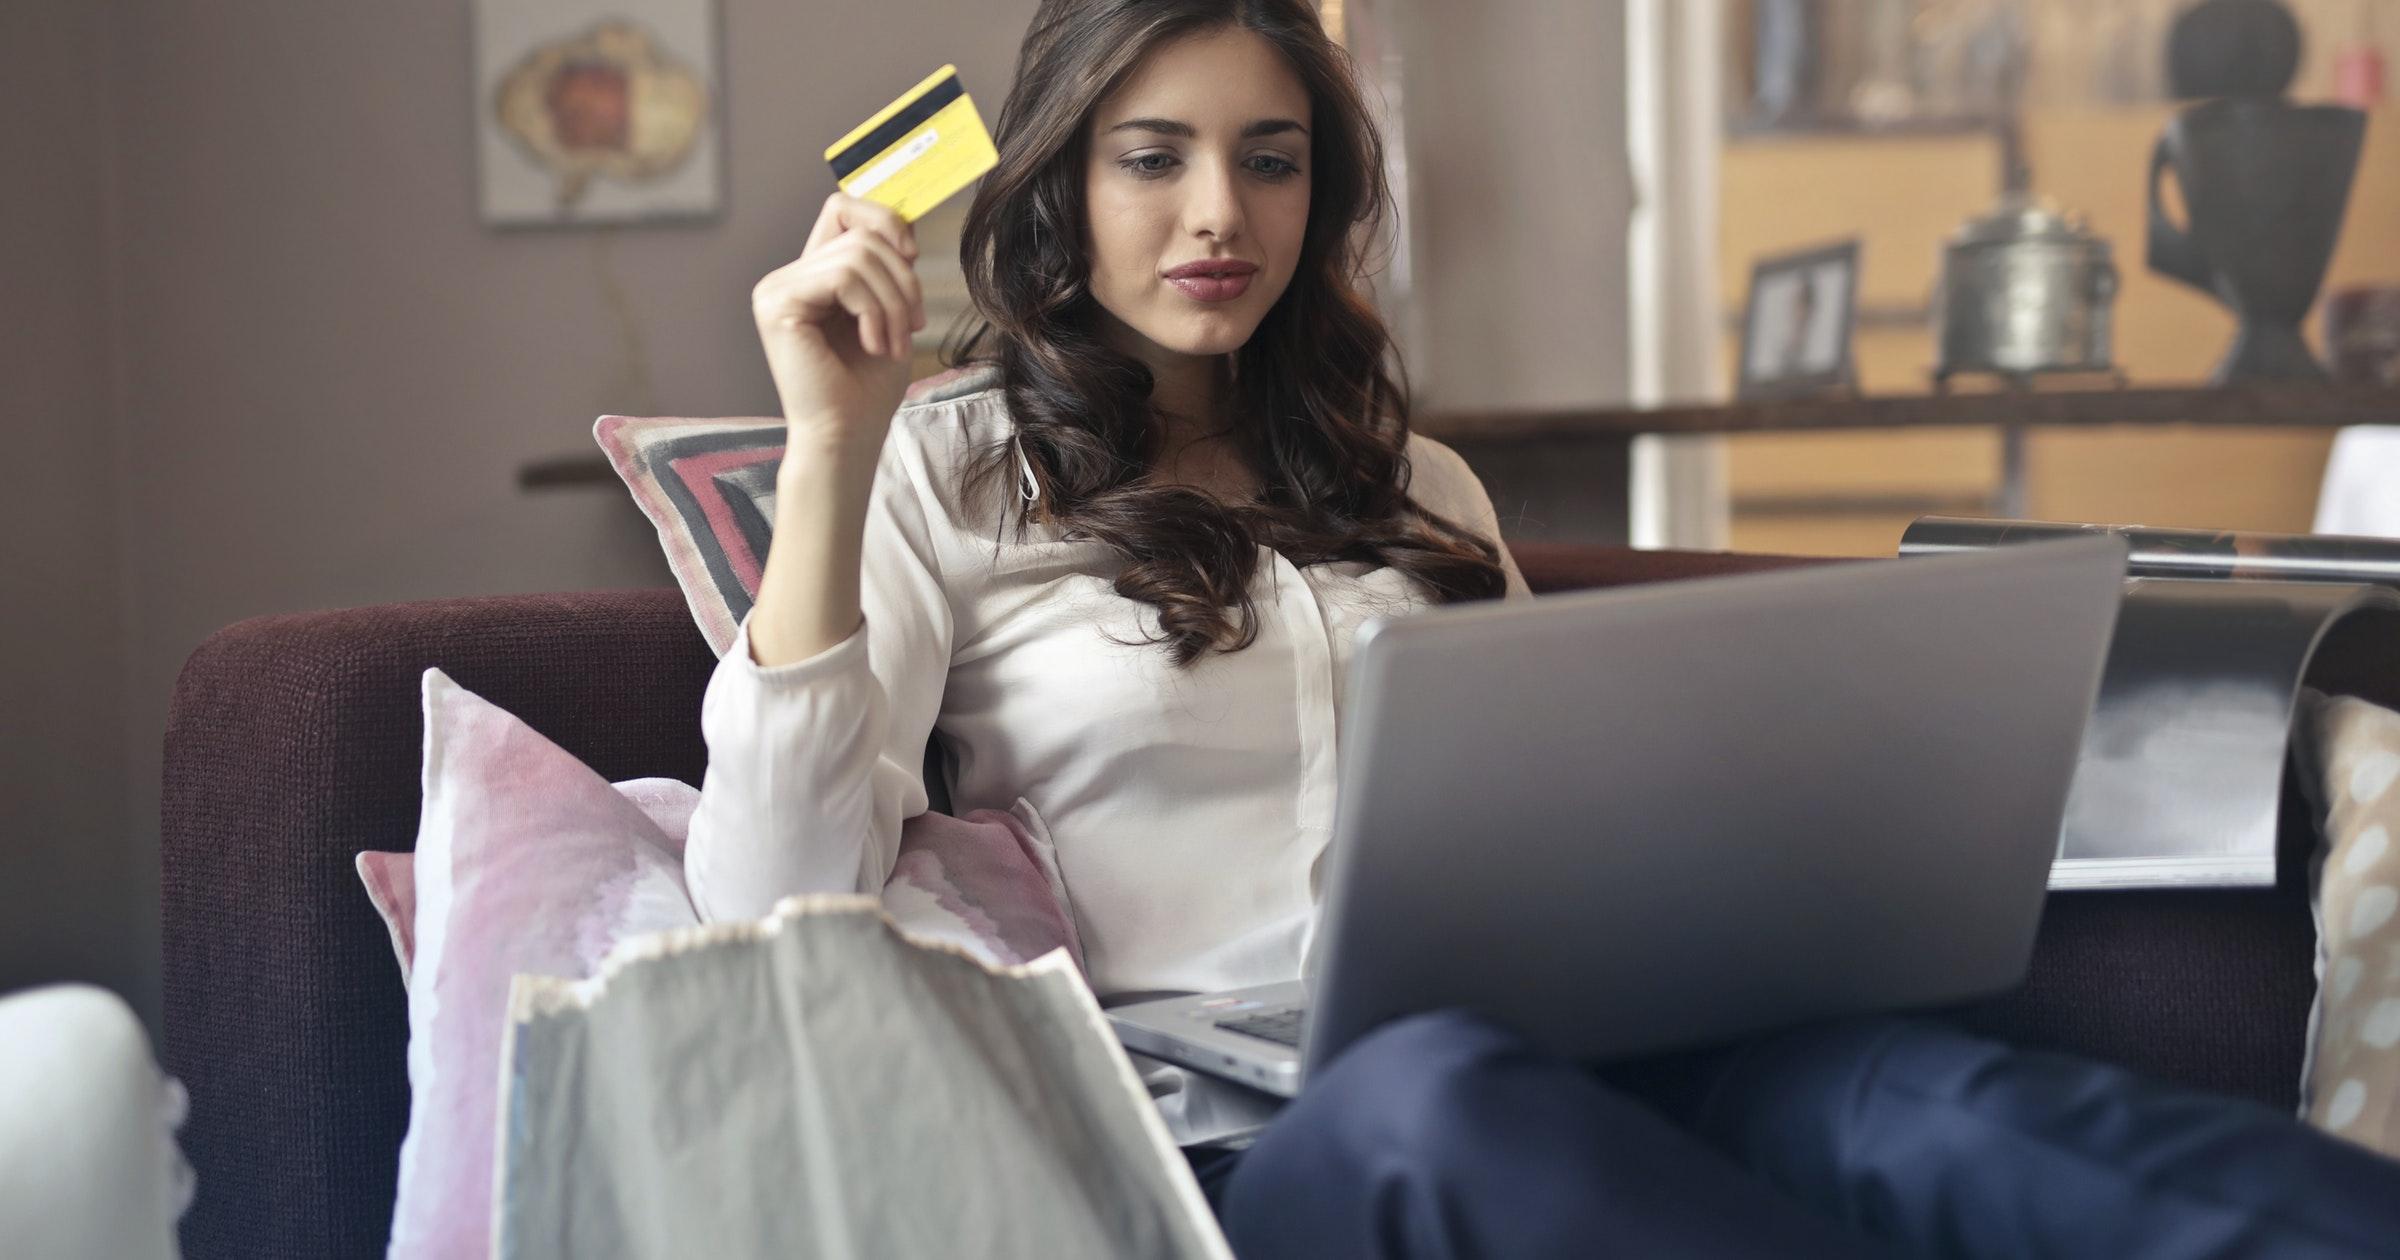 mobipunkt, iphone, iphone äpid, iphone shoppamine, shoppamine äpid, internetis shoppamine